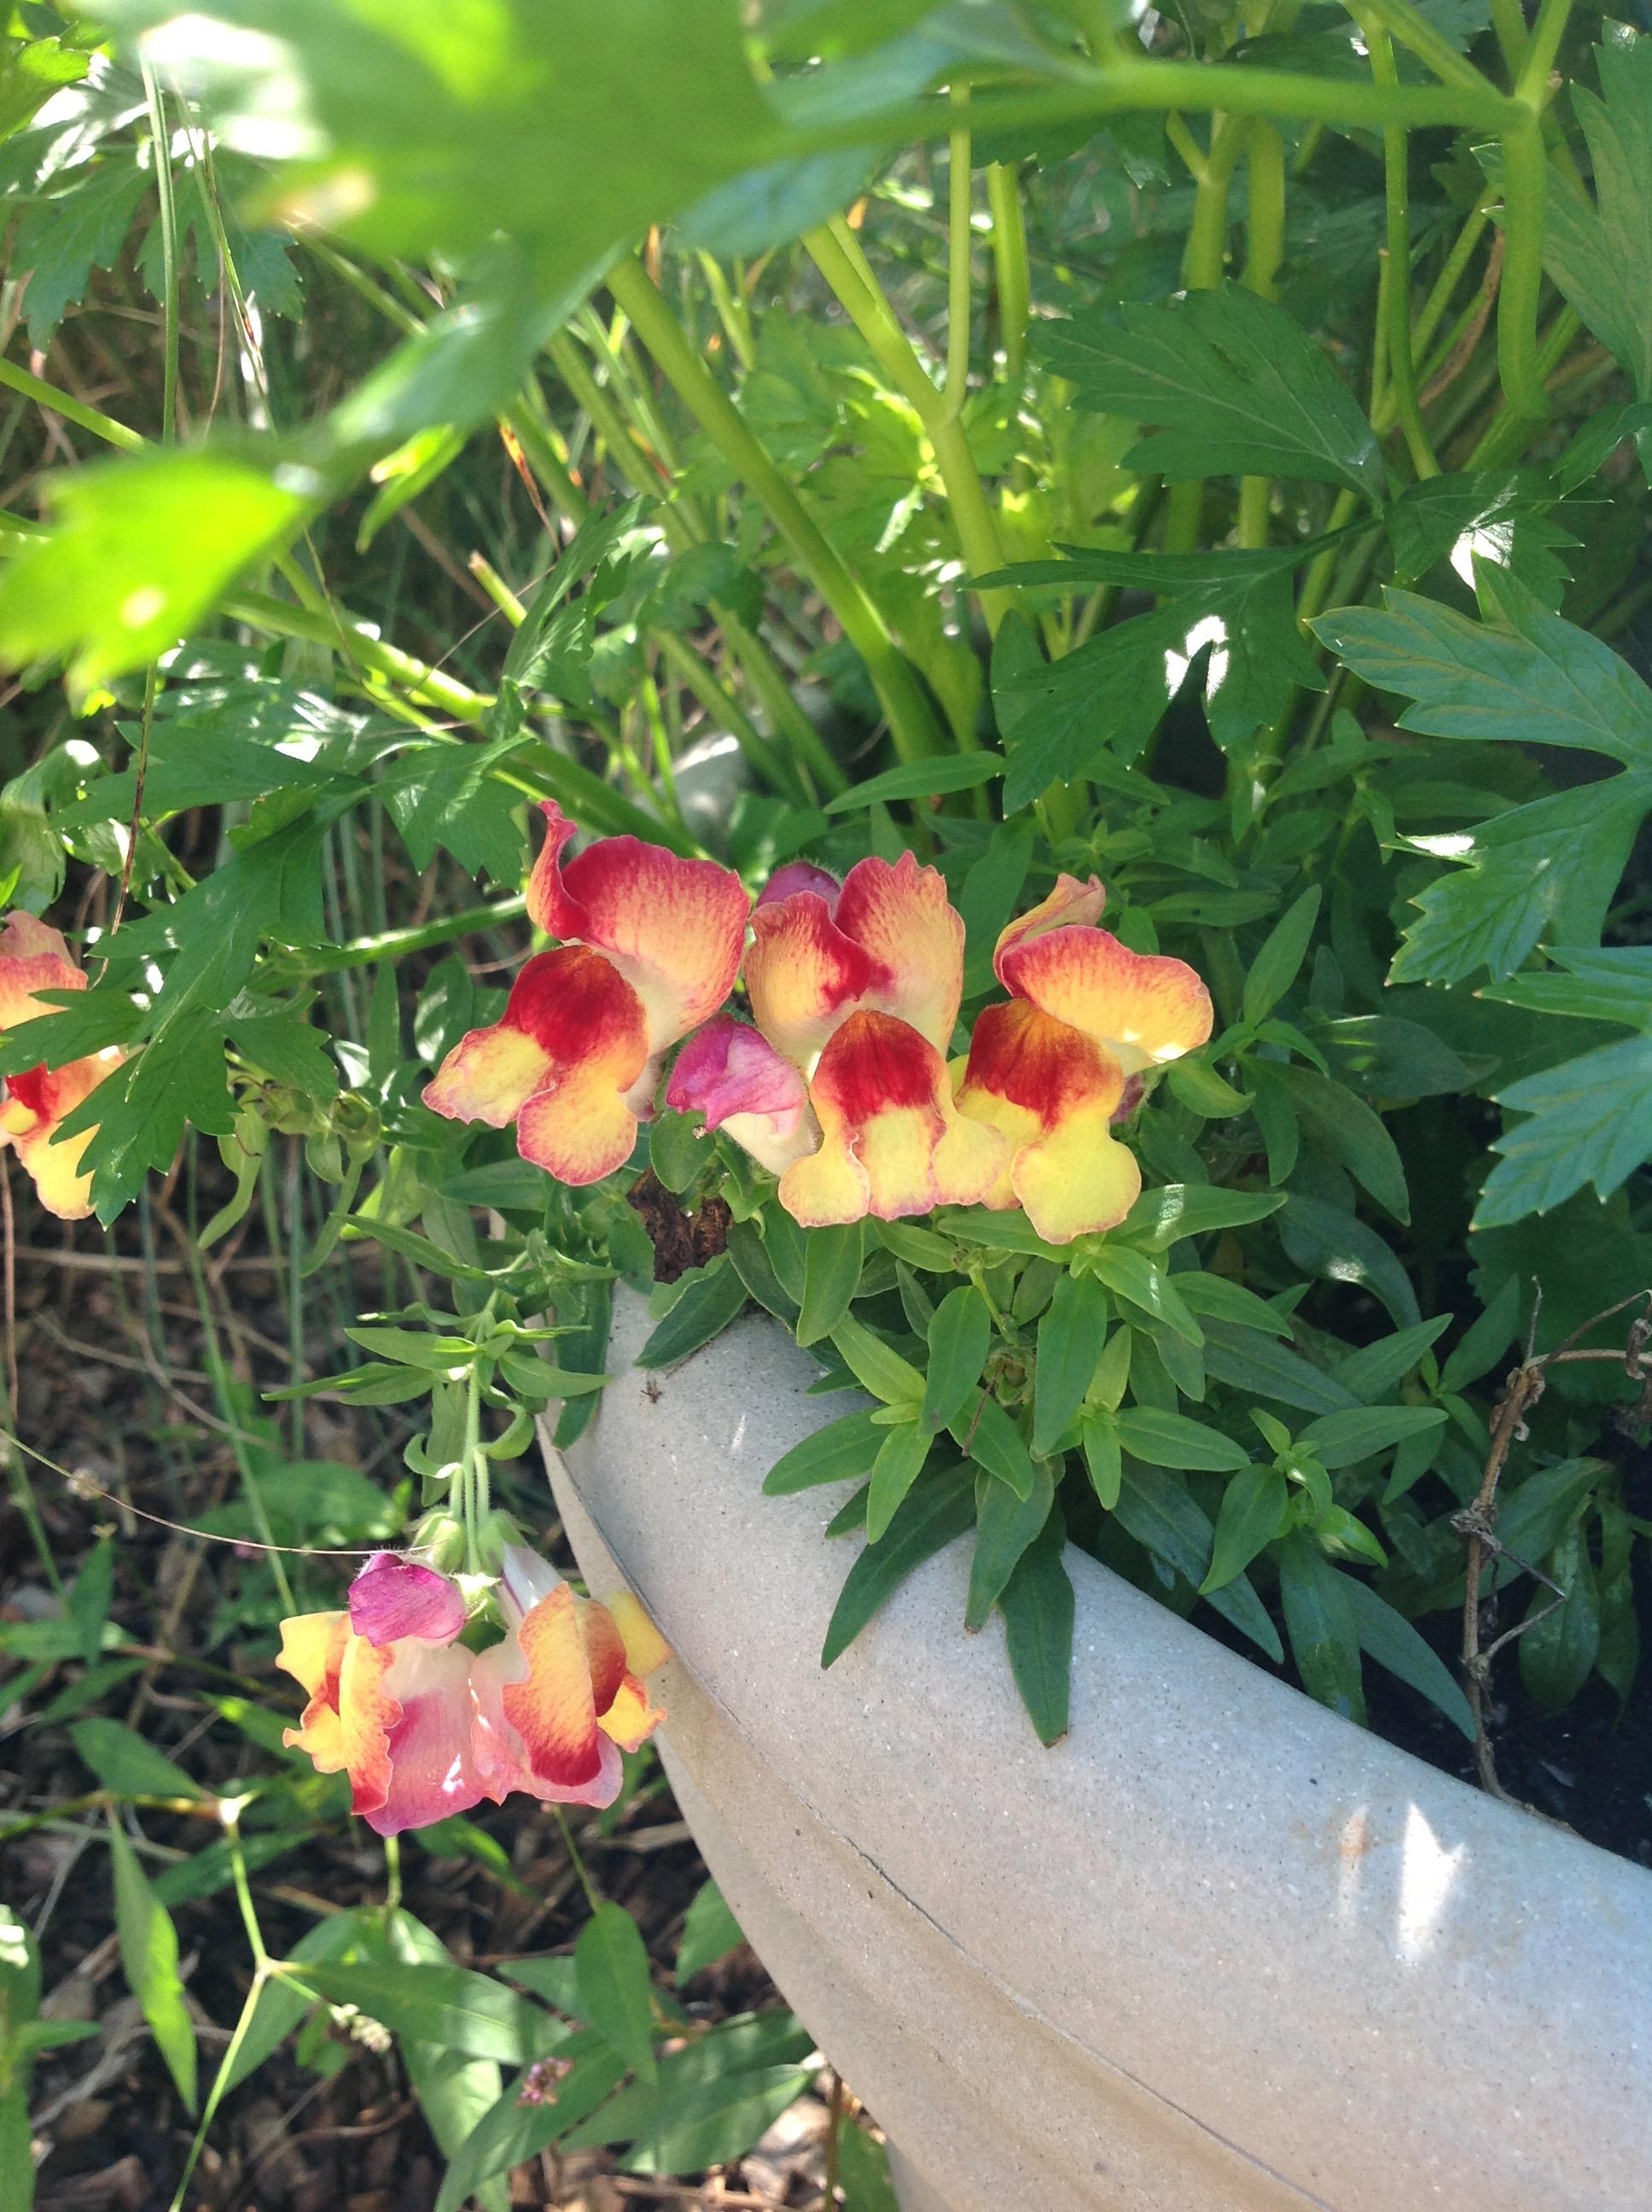 Homegrown Harvest Photo Share – Week 3- Snapdragons